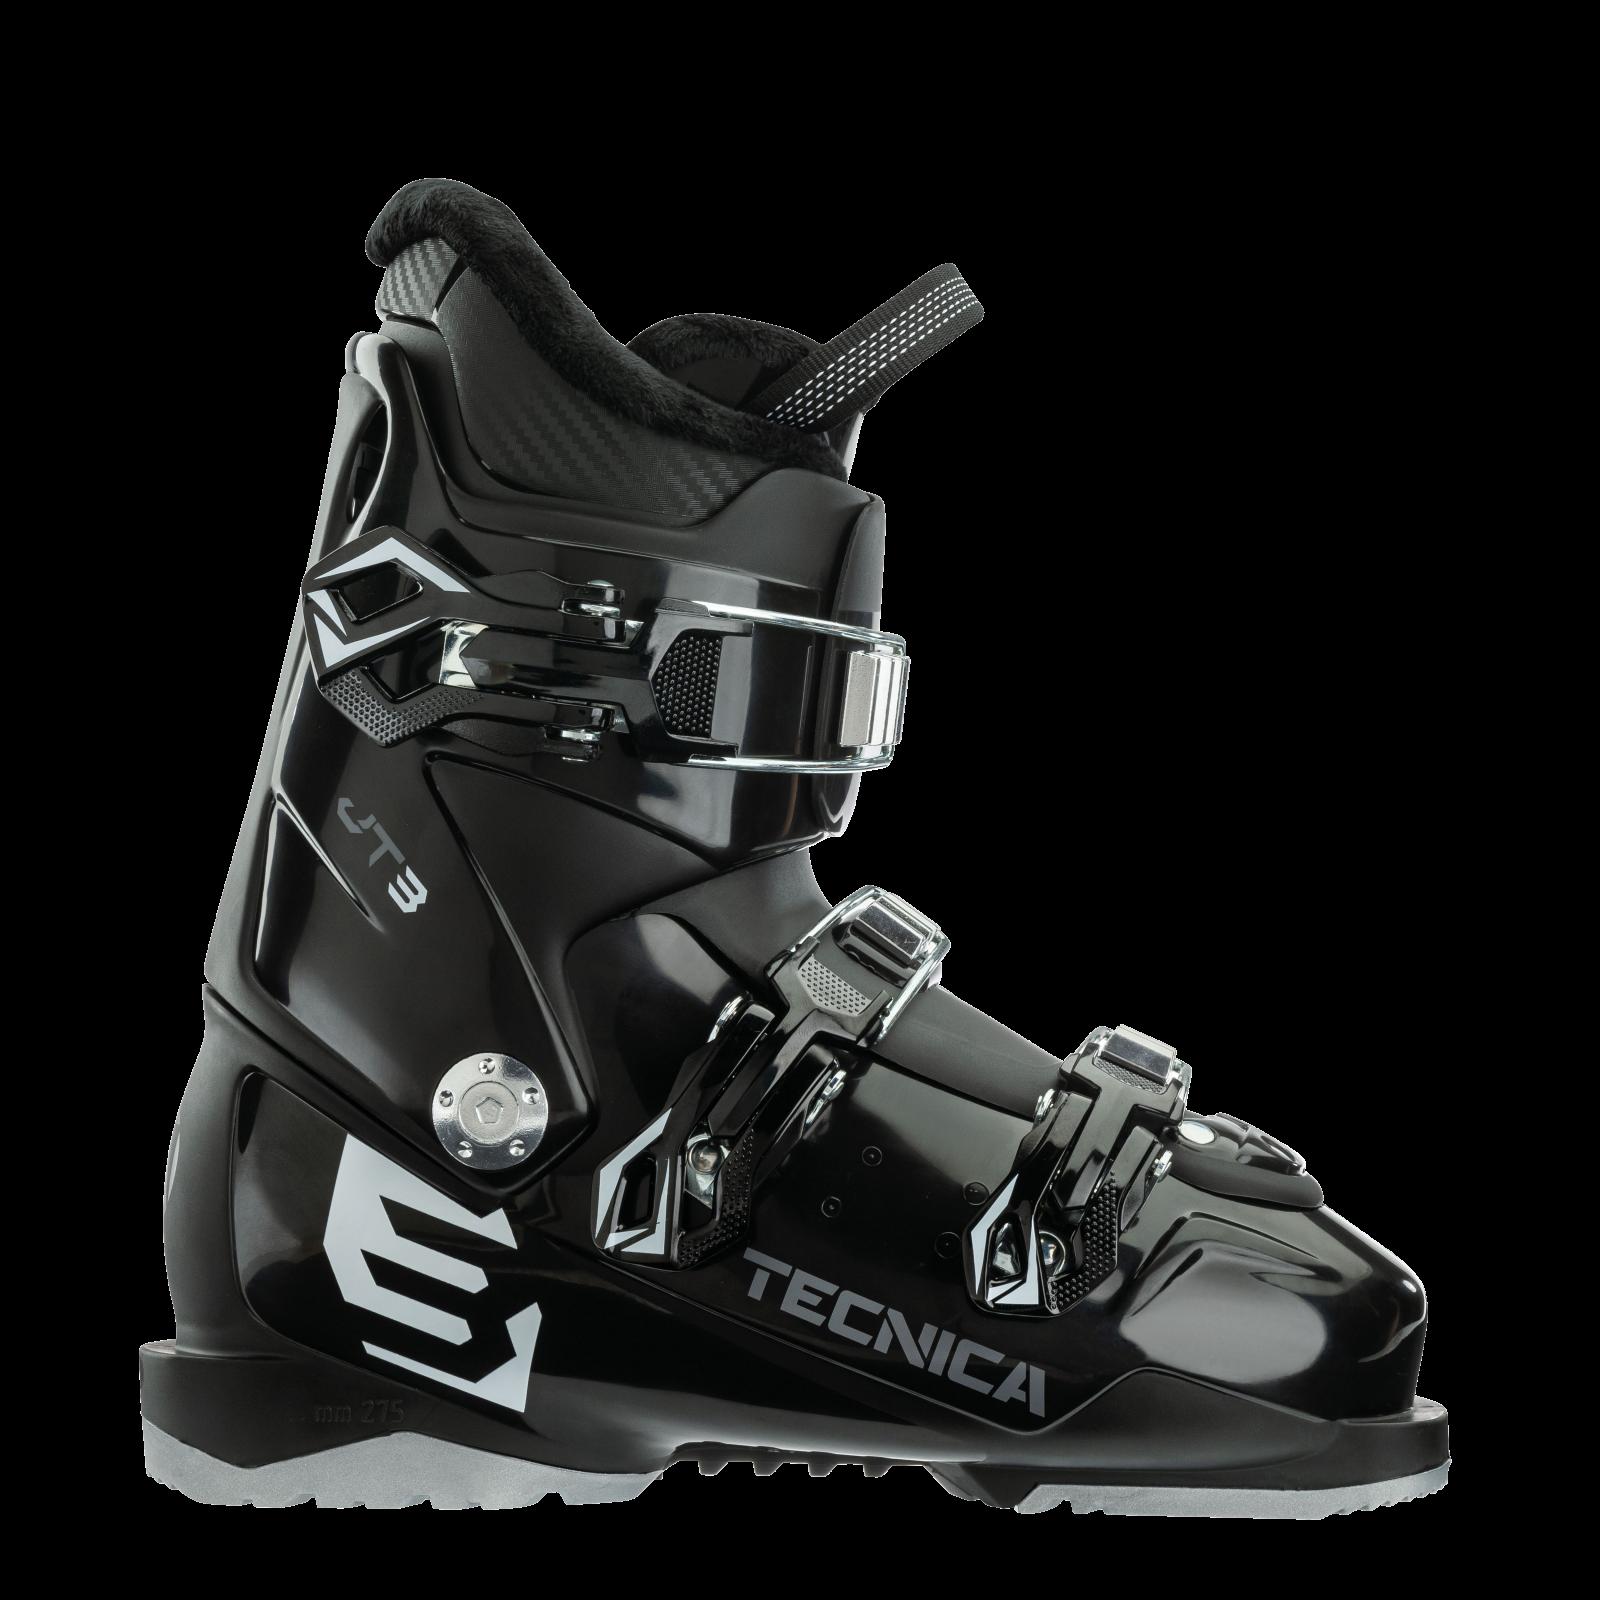 2021 Tecnica JT 3 Junior Ski Boots